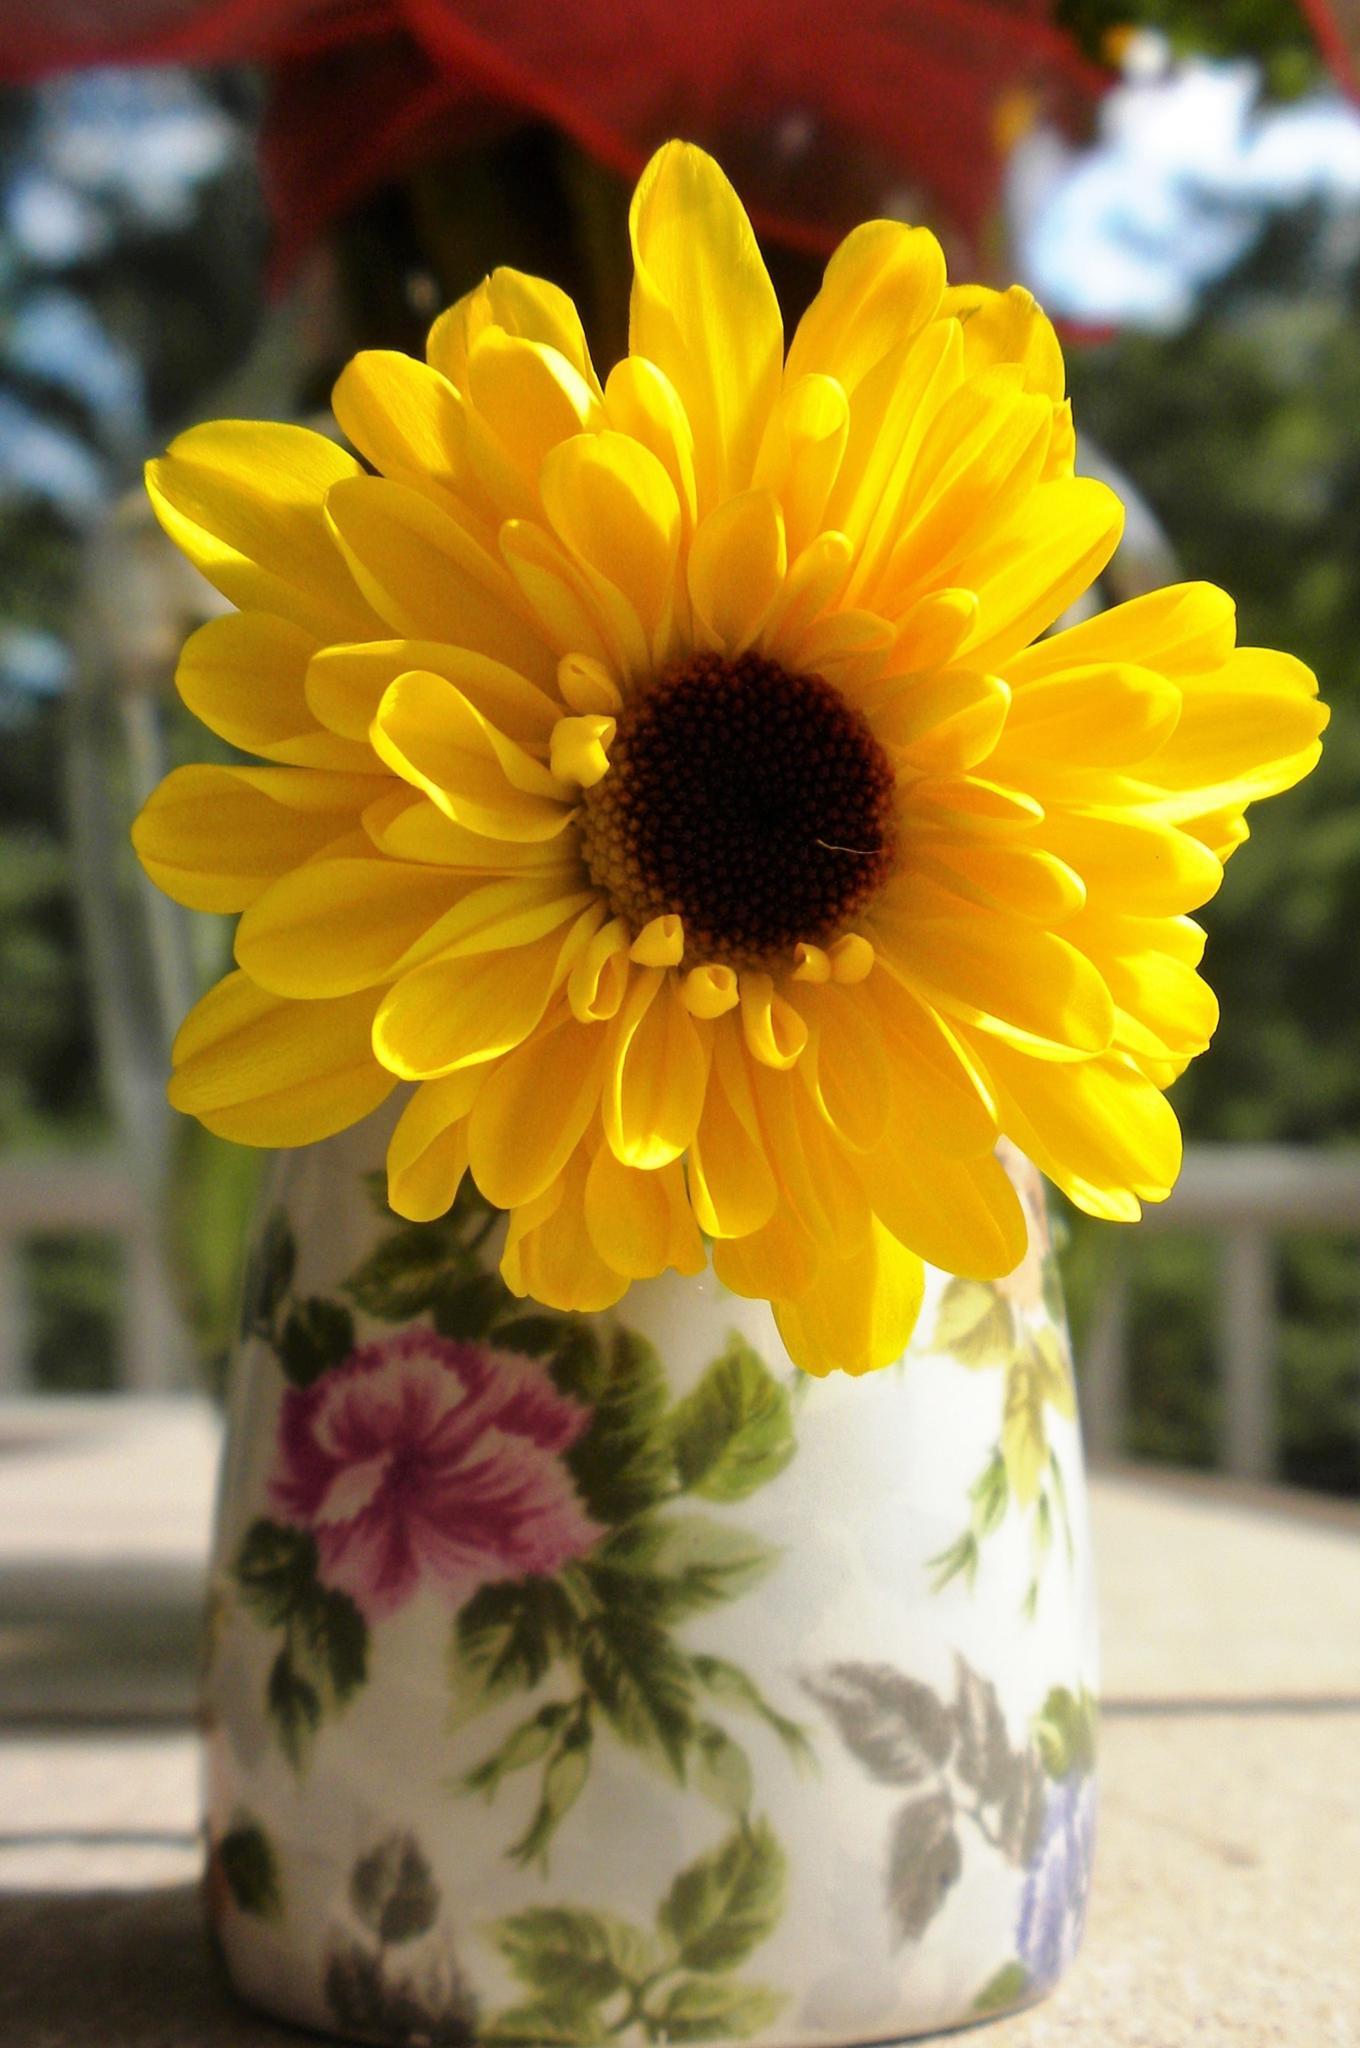 Little Flower, Little Vase by heavenbound2